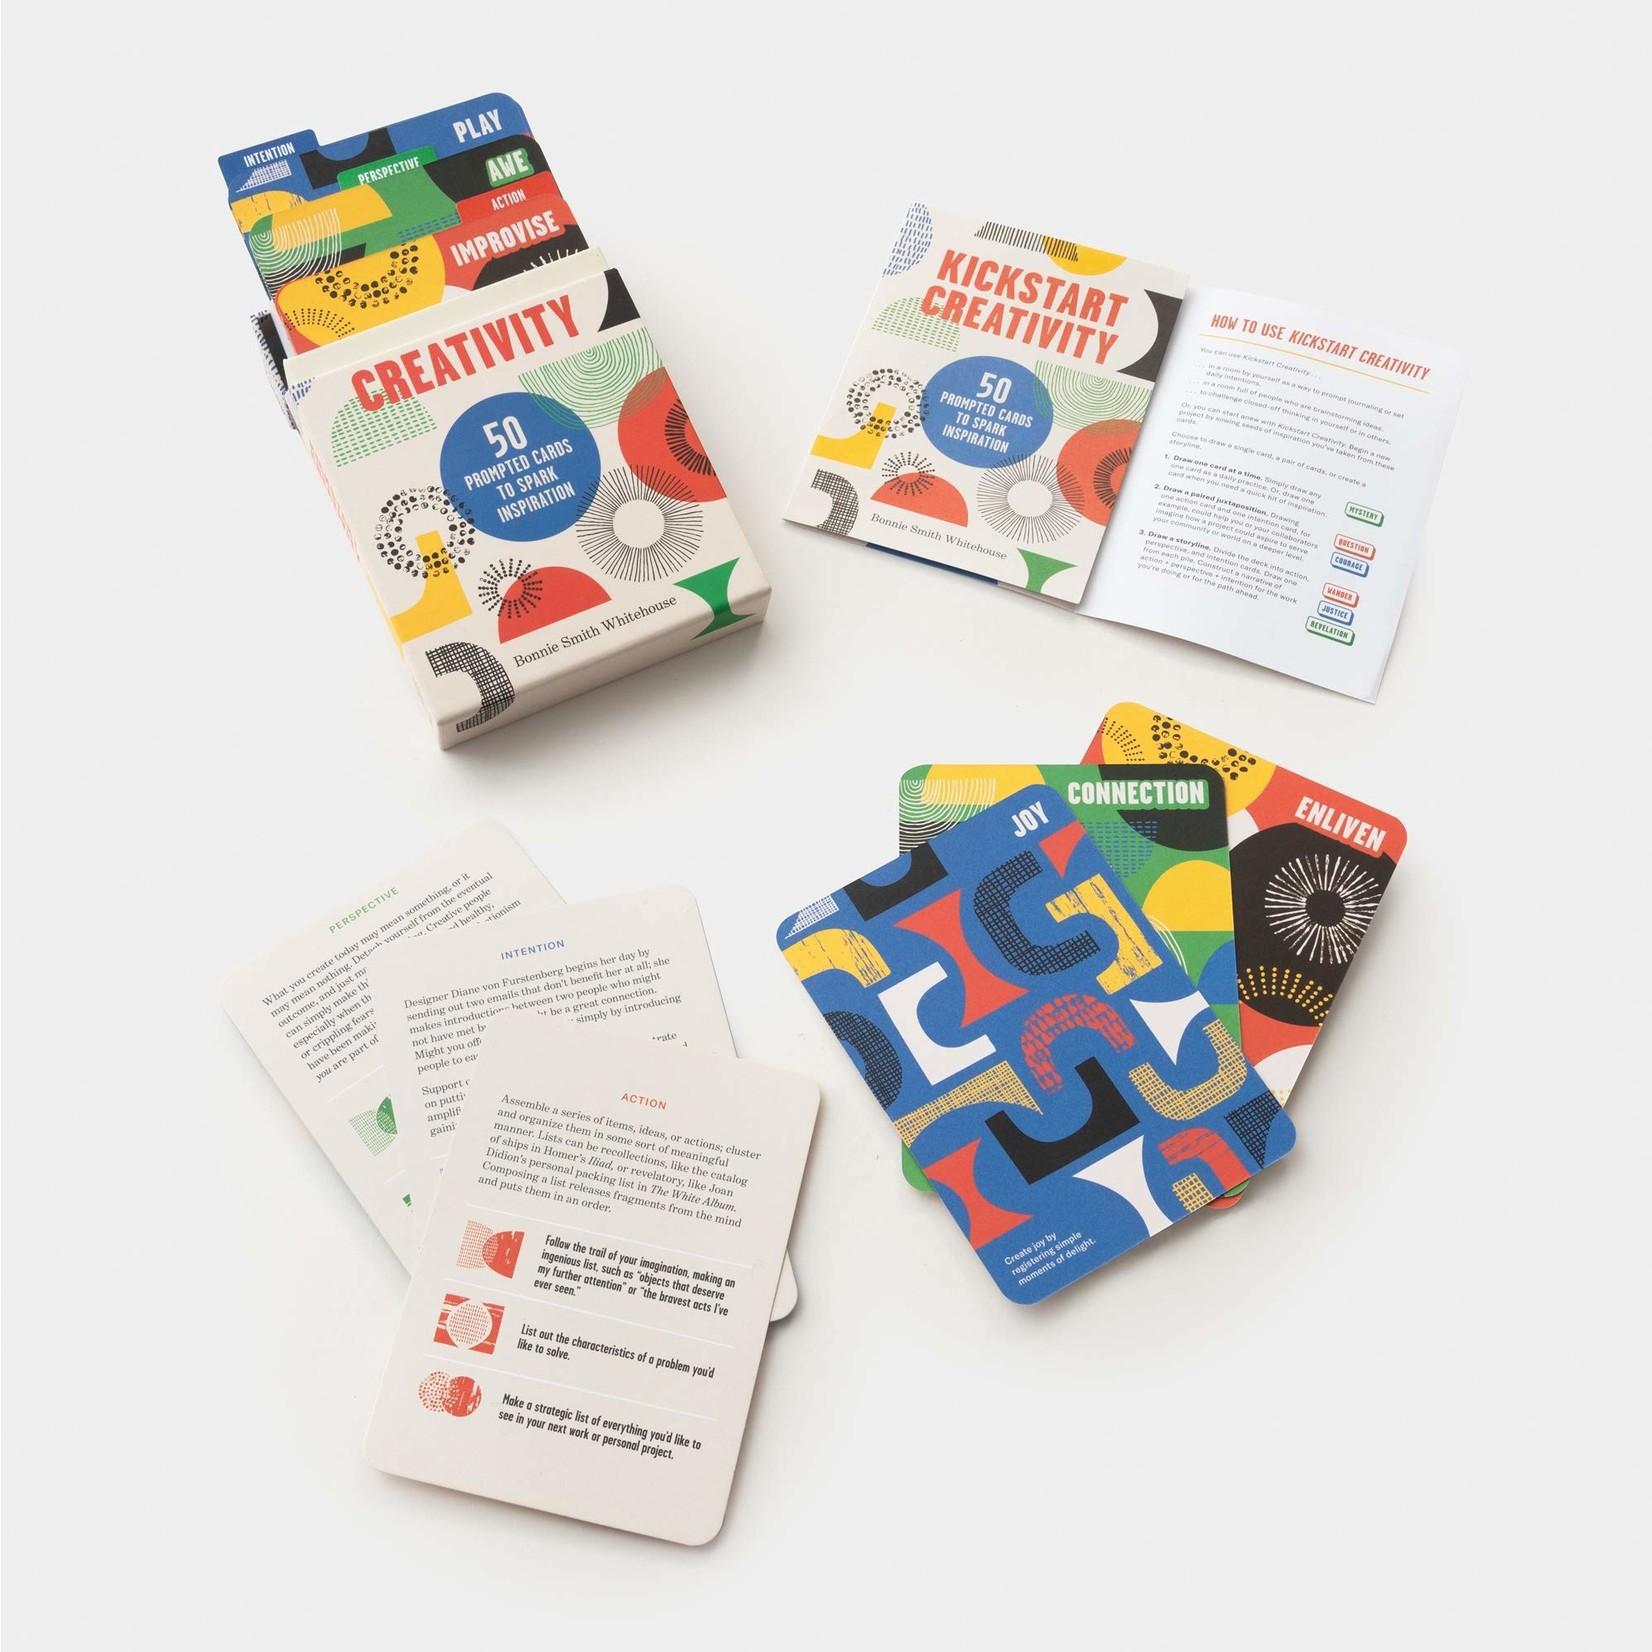 PENGUIN RANDOM  HOUSE KICKSTART CREATIVITY CARDS